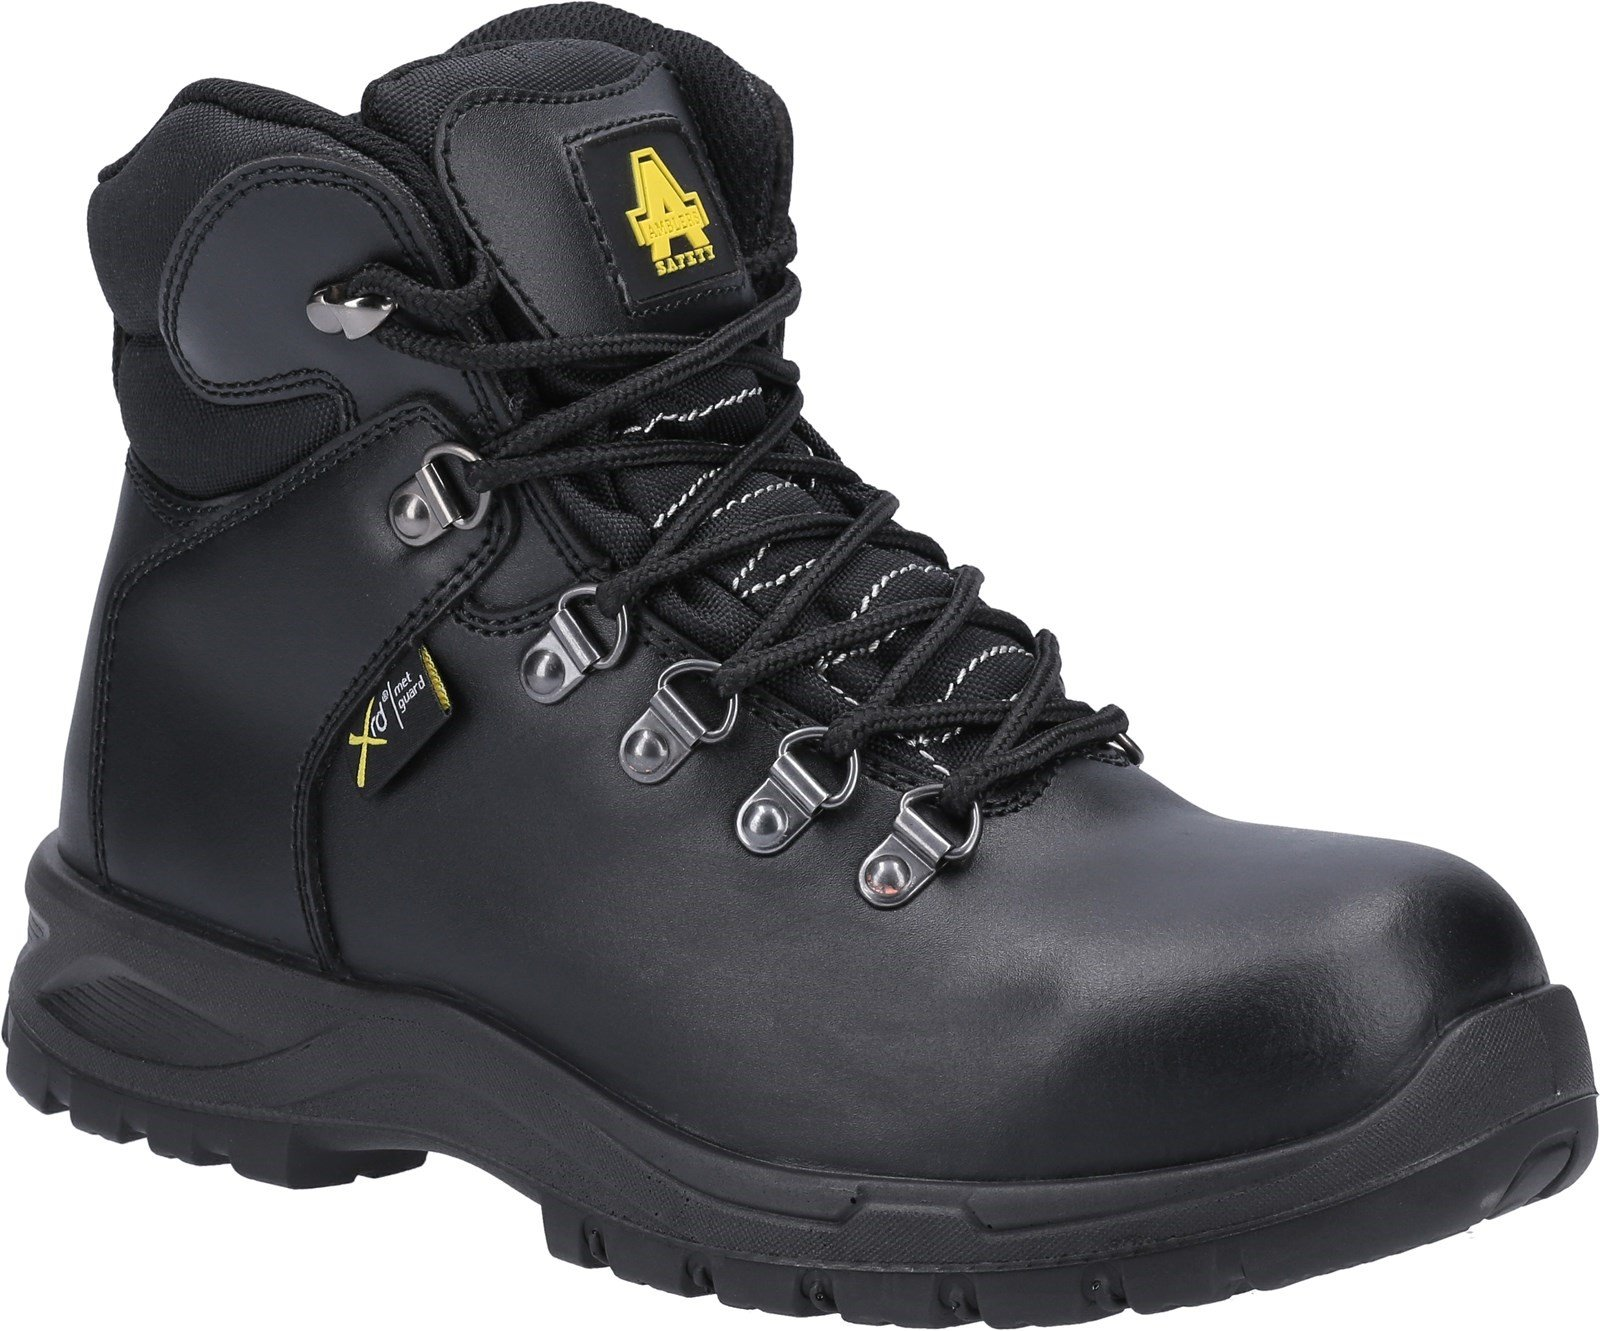 Amblers Safety Women's Boots Black 31376 - Black 3